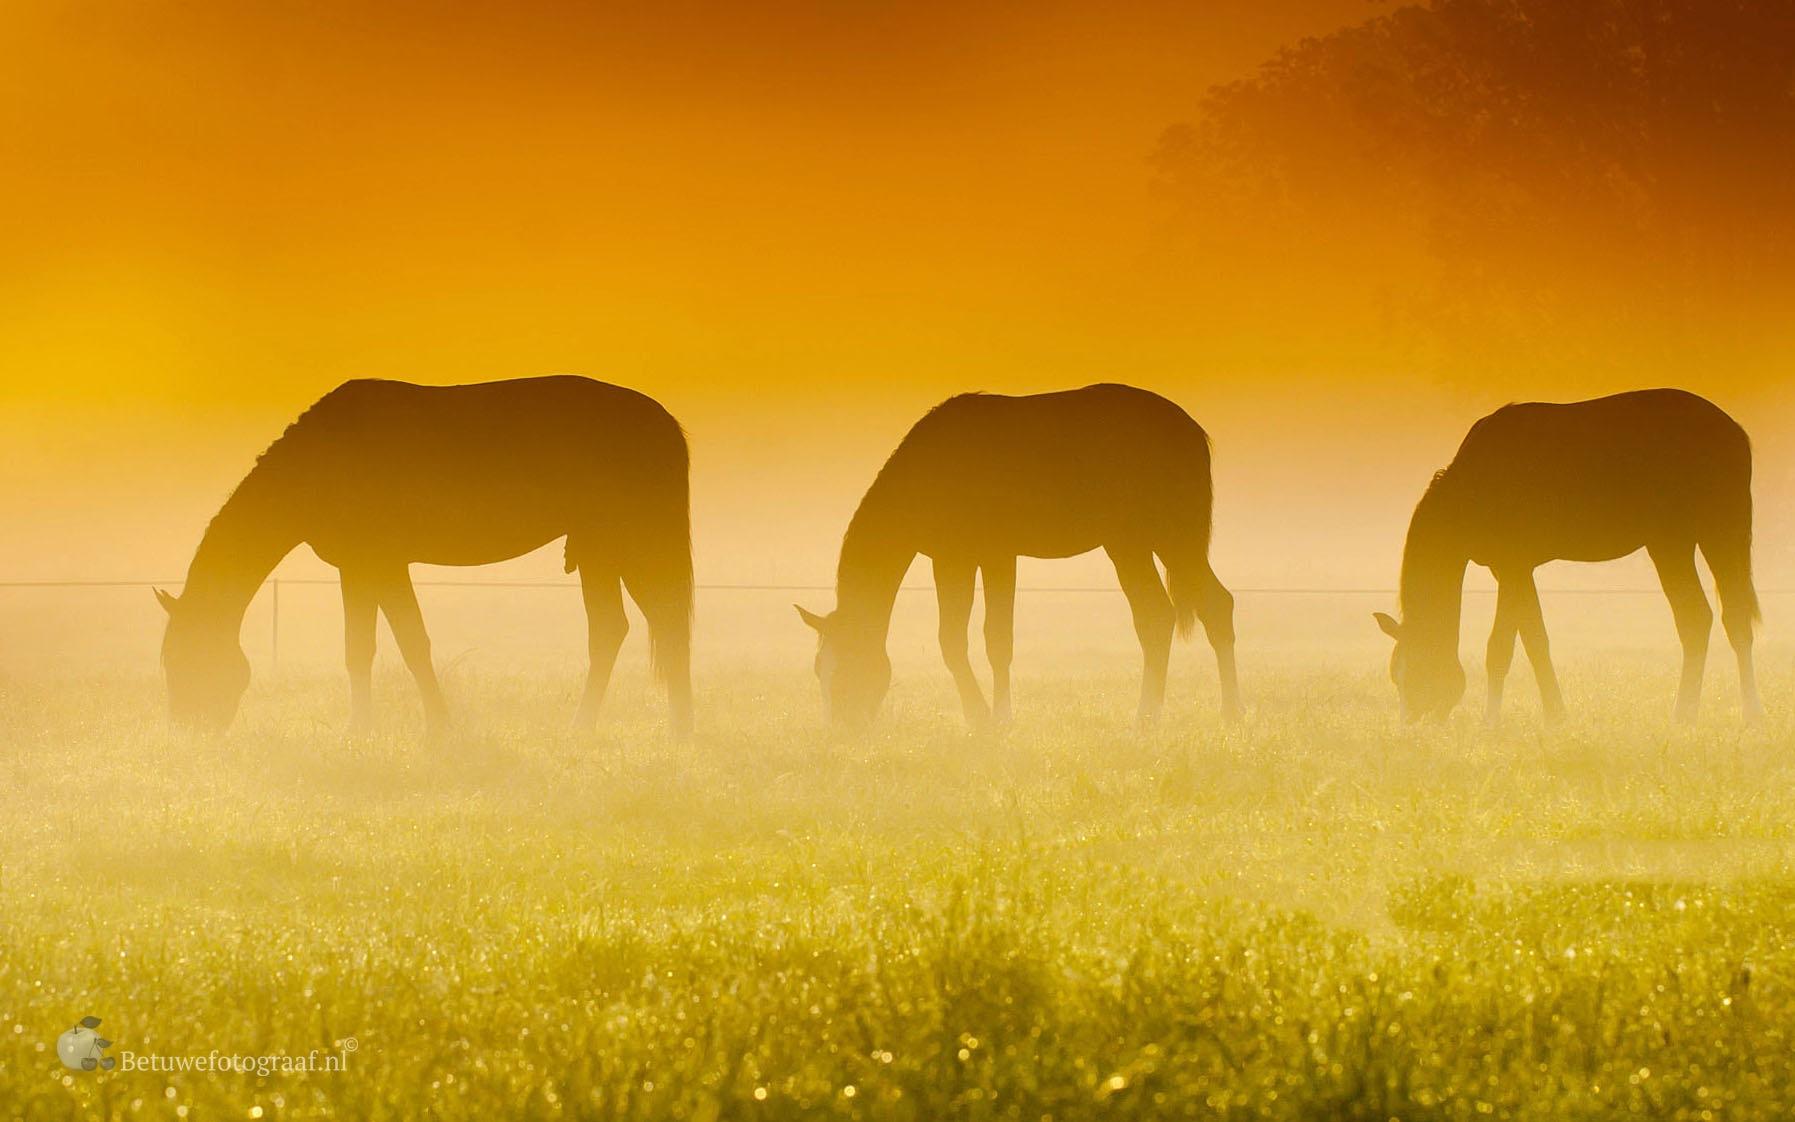 Three of a Kind by Betuwefotograaf